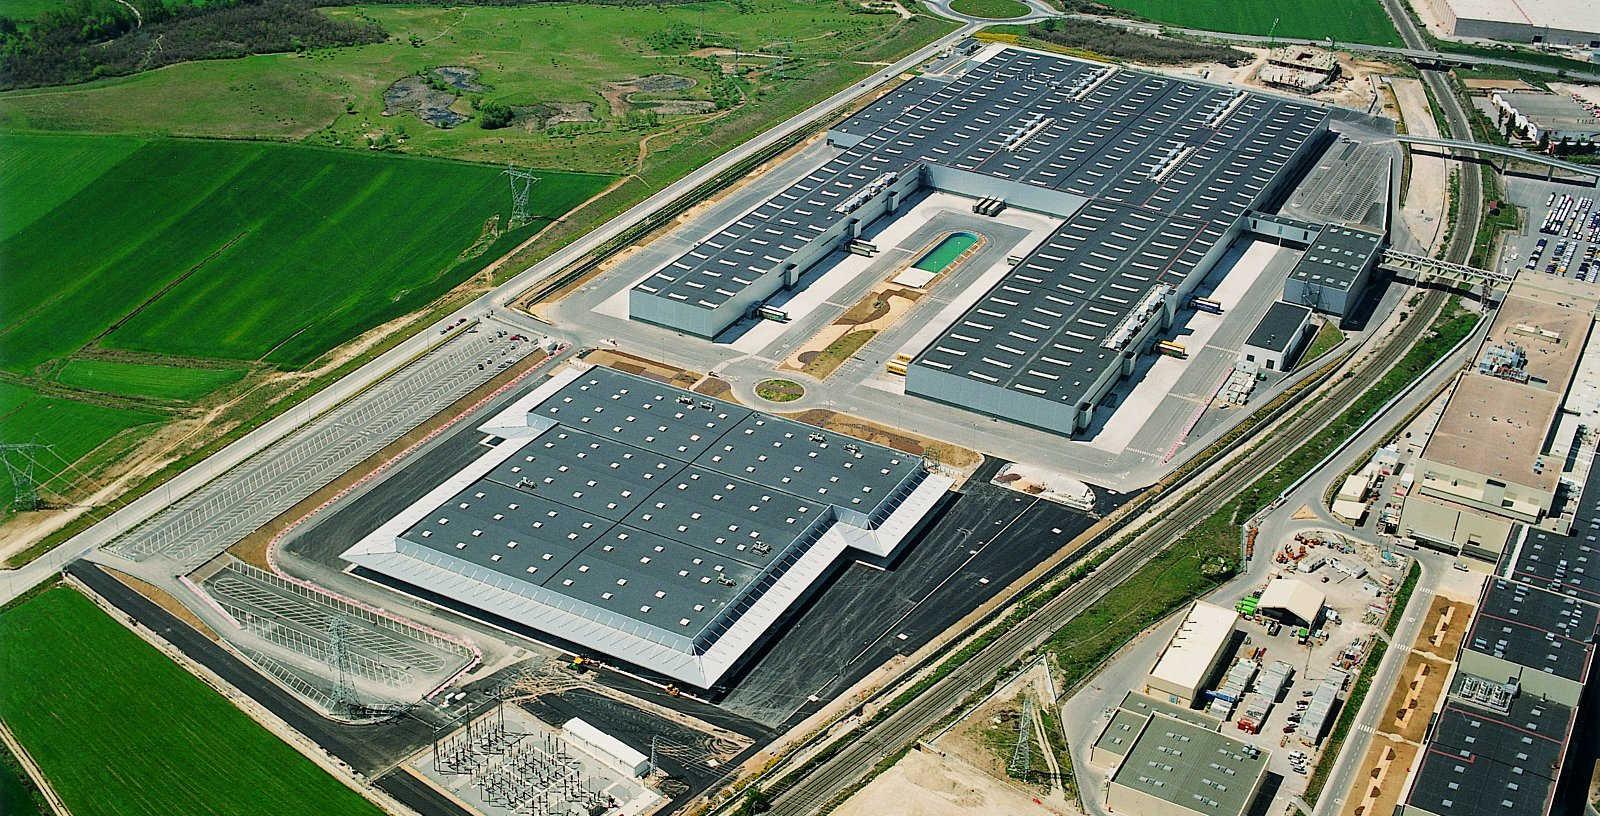 MERCEDES_BENZ_EPCM_Automobile_manufacturing_plantas_02_Idom